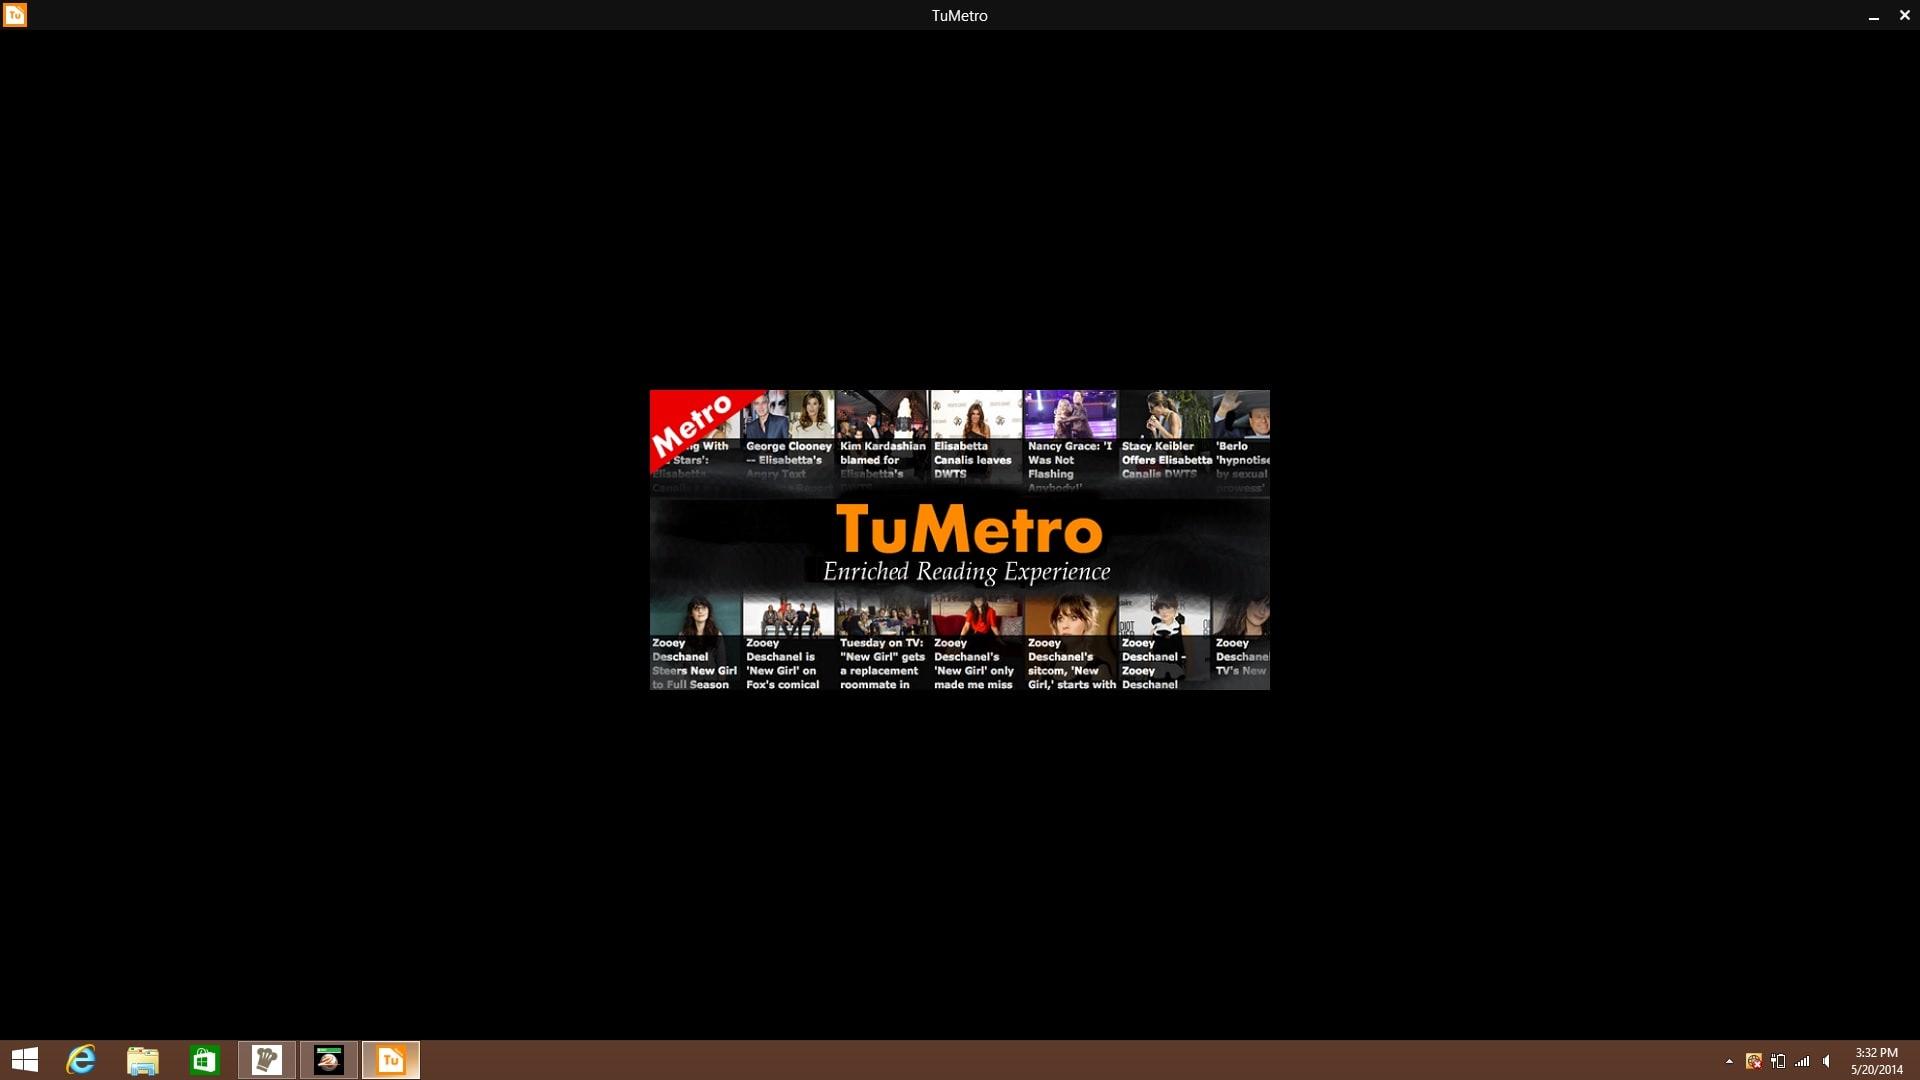 A screenshot of the Tu Metro app.